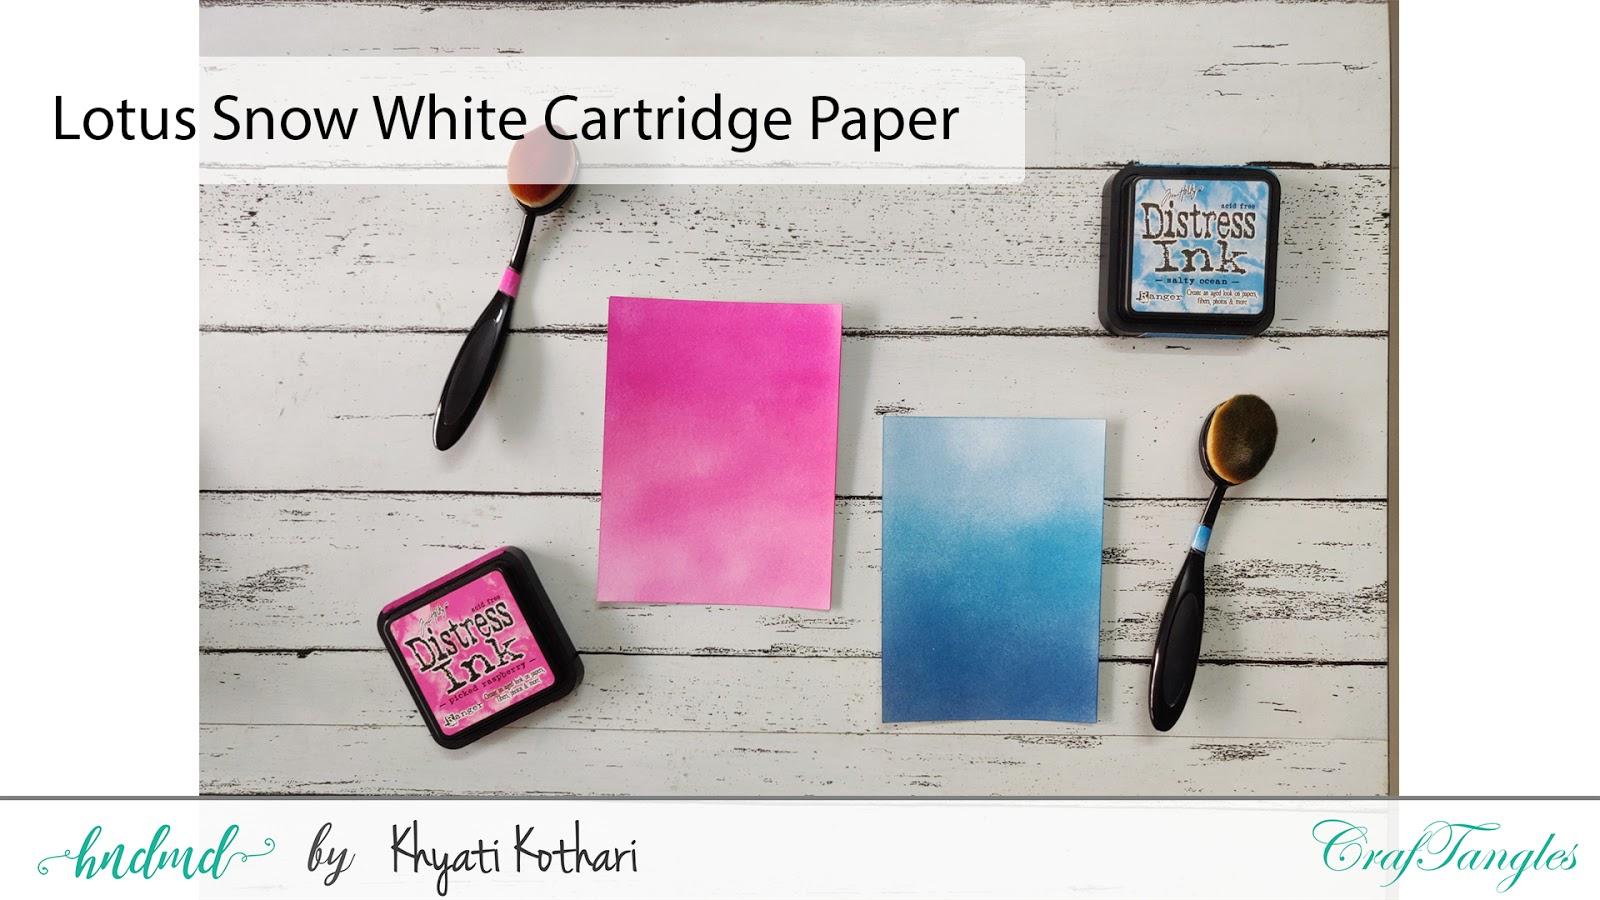 Introducing CrafTangles Ink blending brushes 14